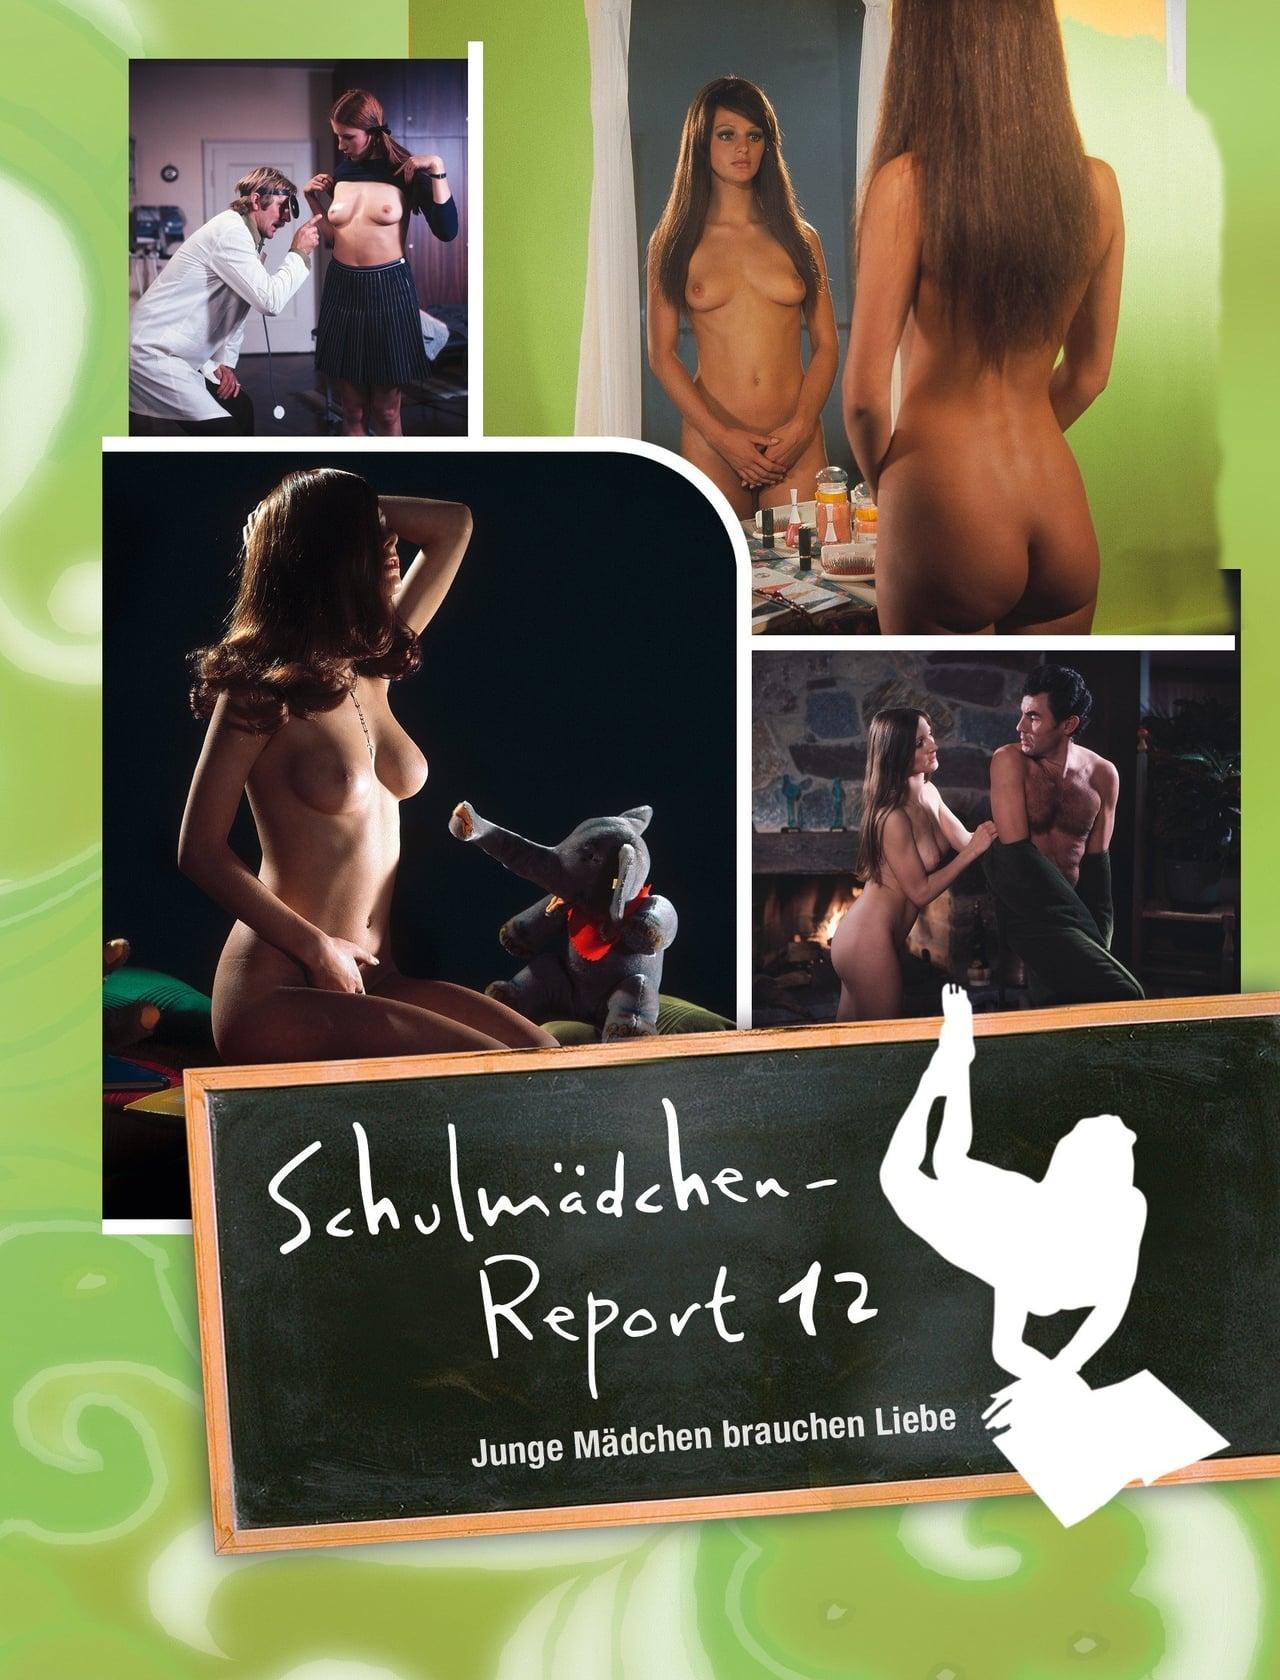 Schoolgirl Report Part 12: If Mom Only Knew...